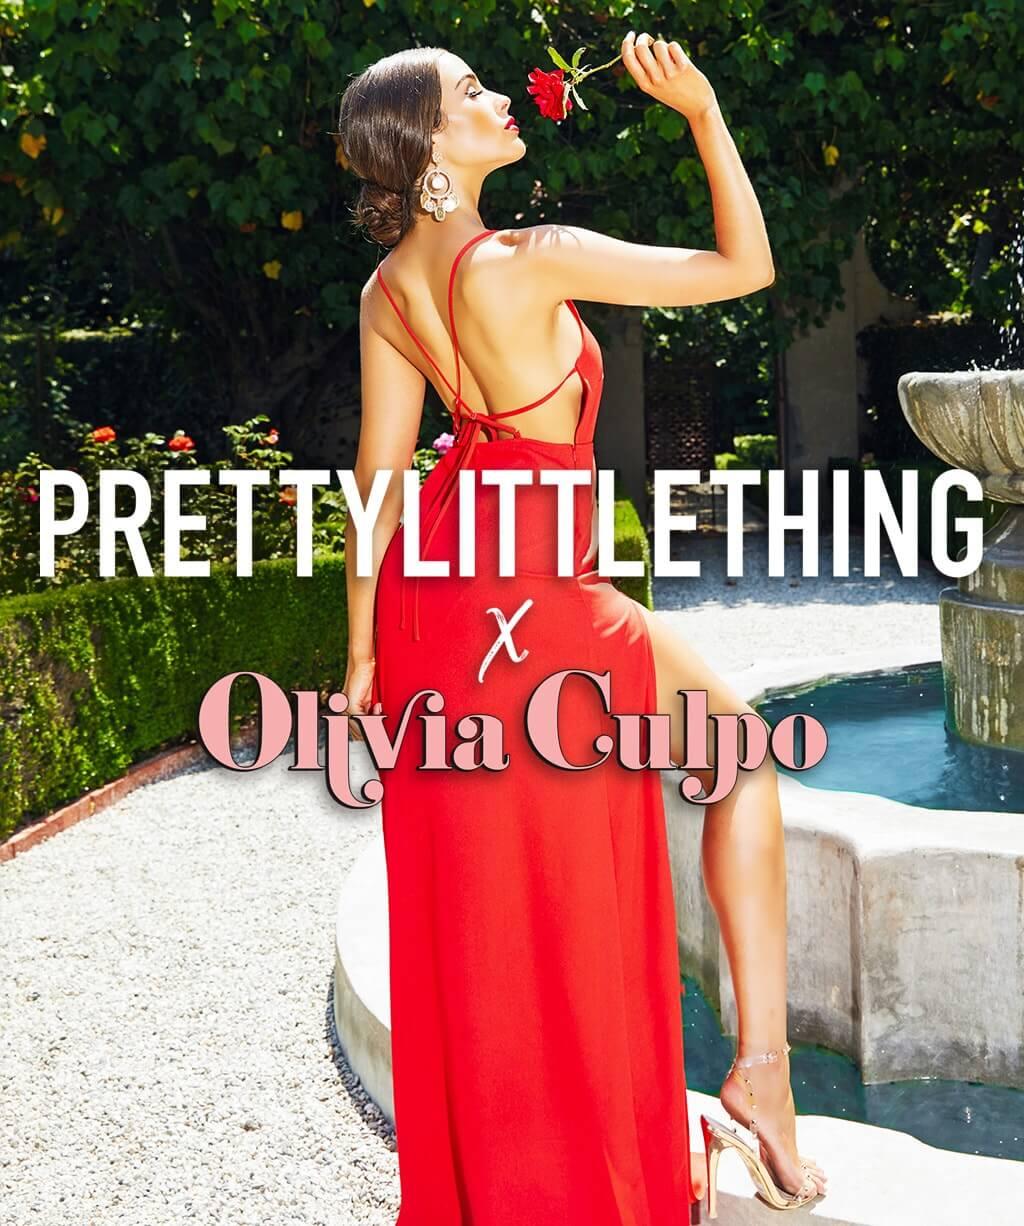 Olivia Culpo Ad | PrettyLittleThing